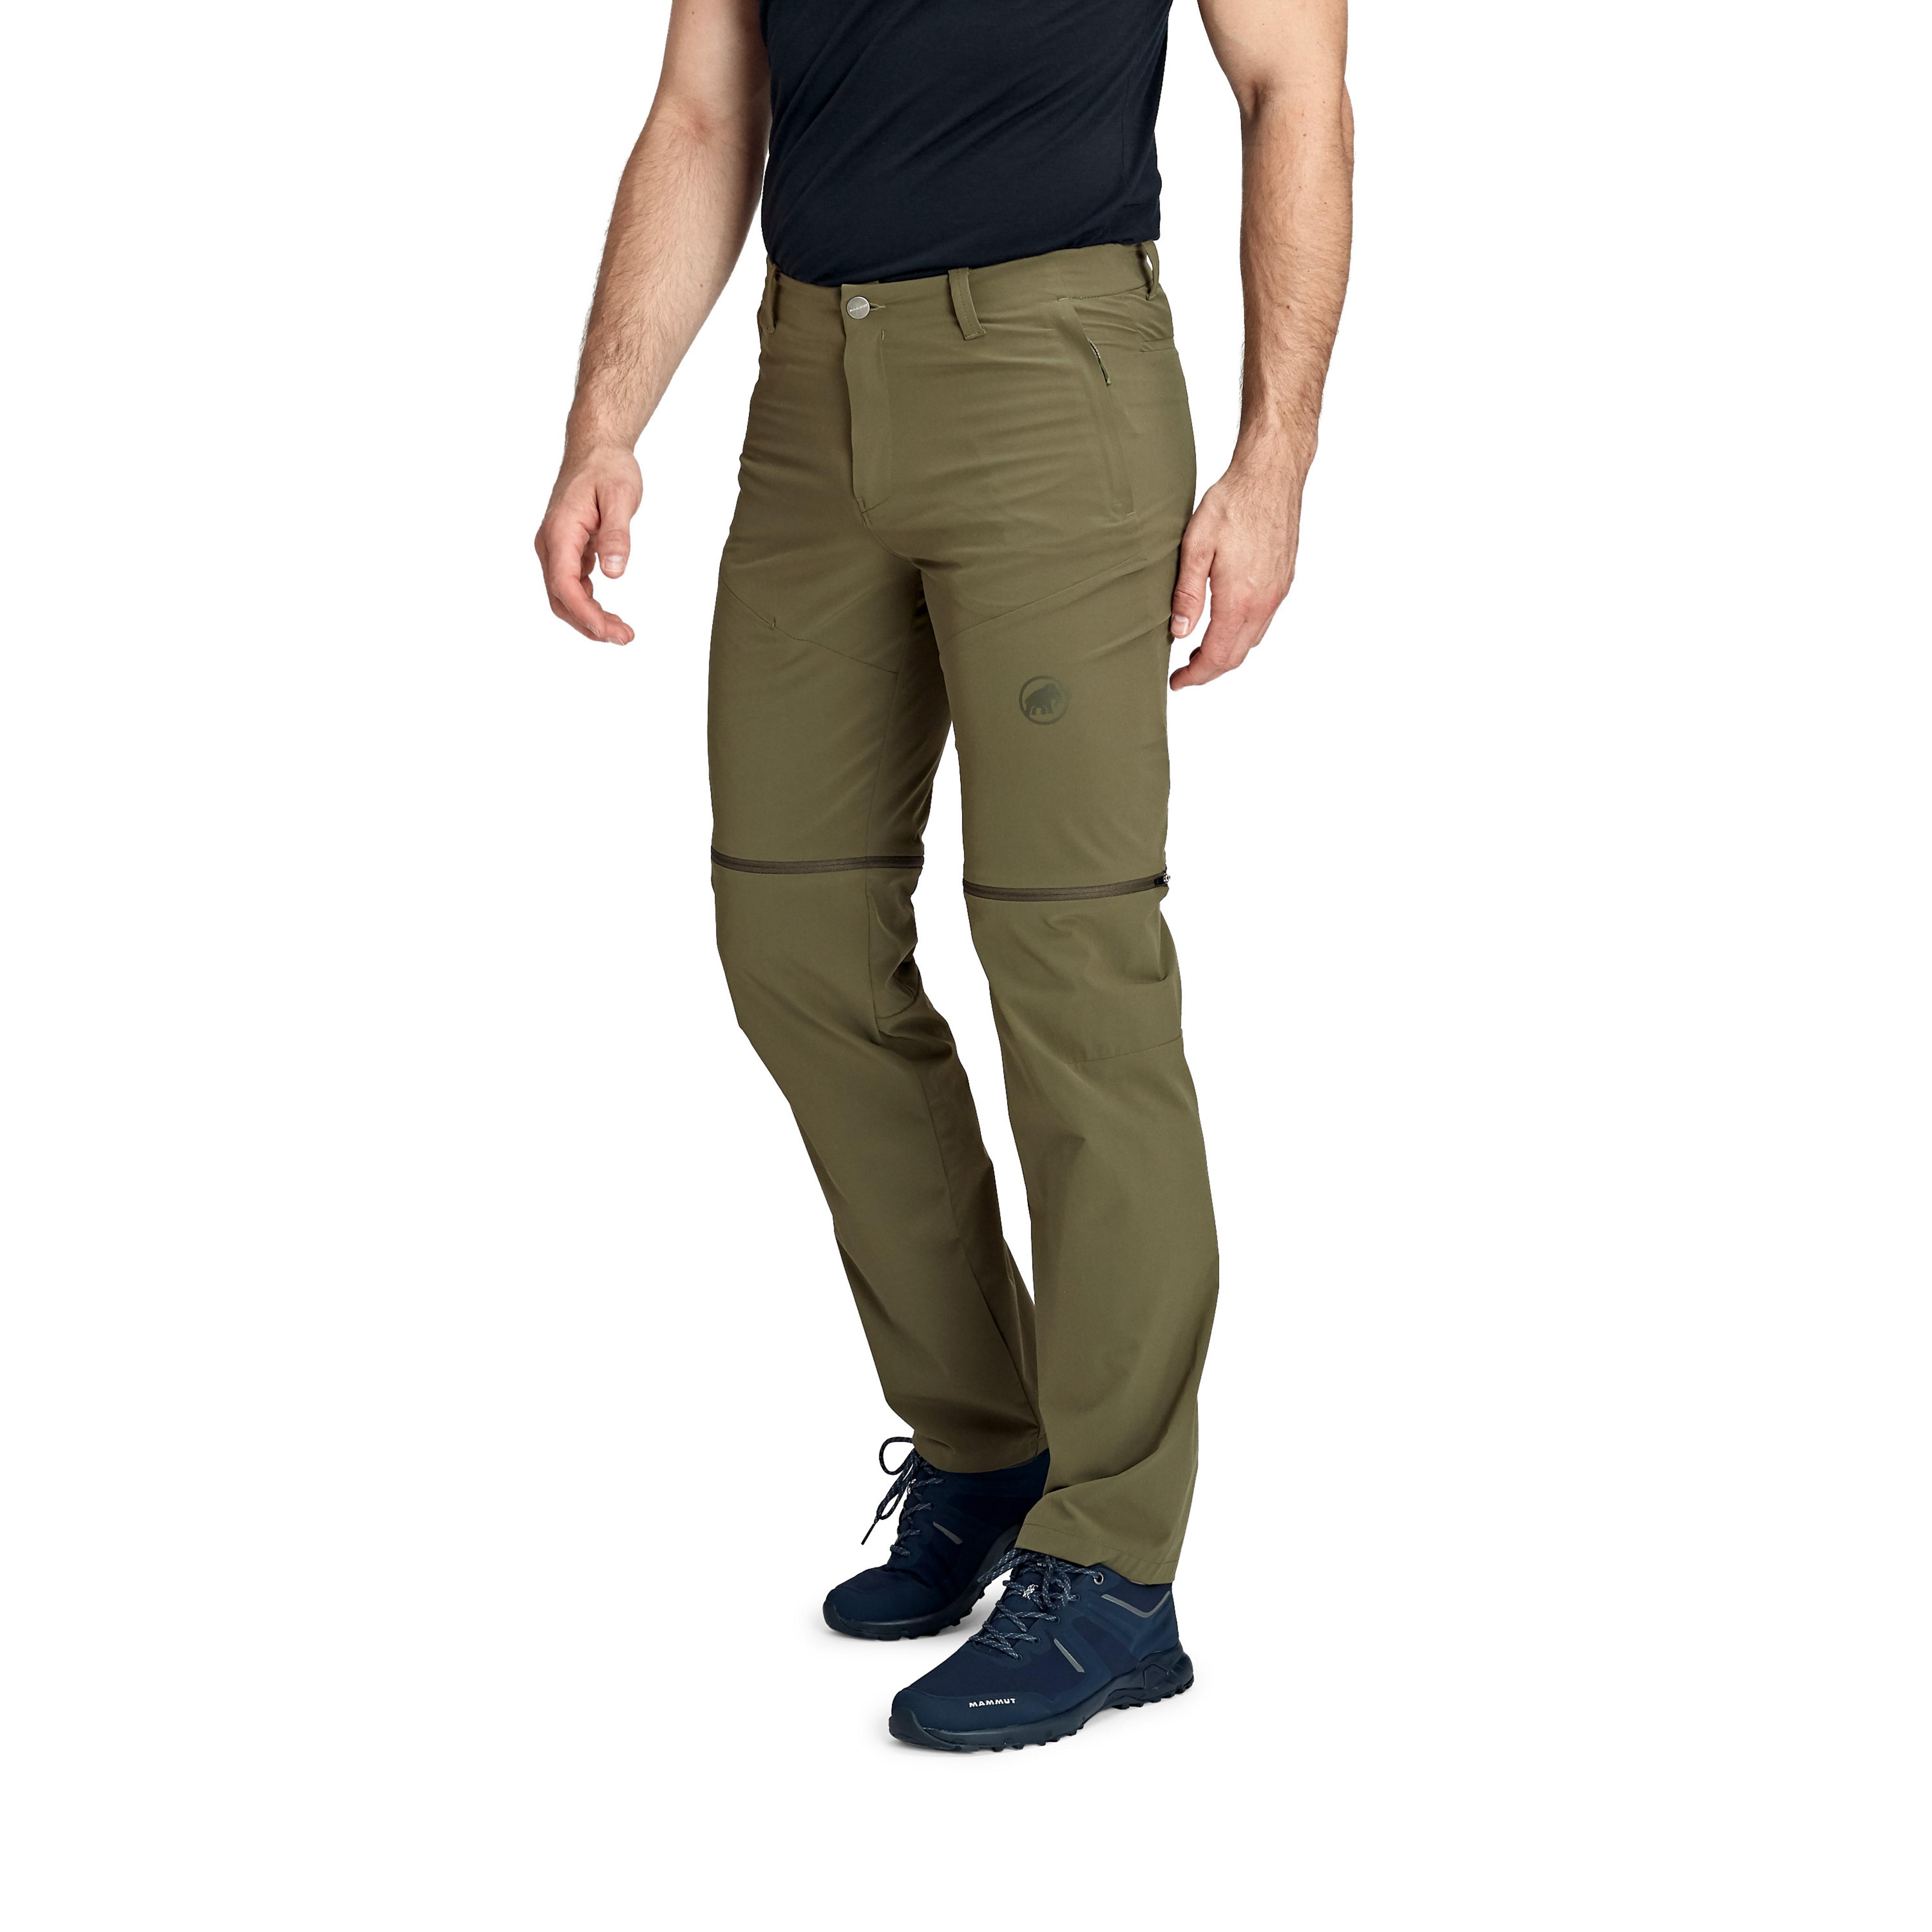 Runbold Zip Off Pants Men product image